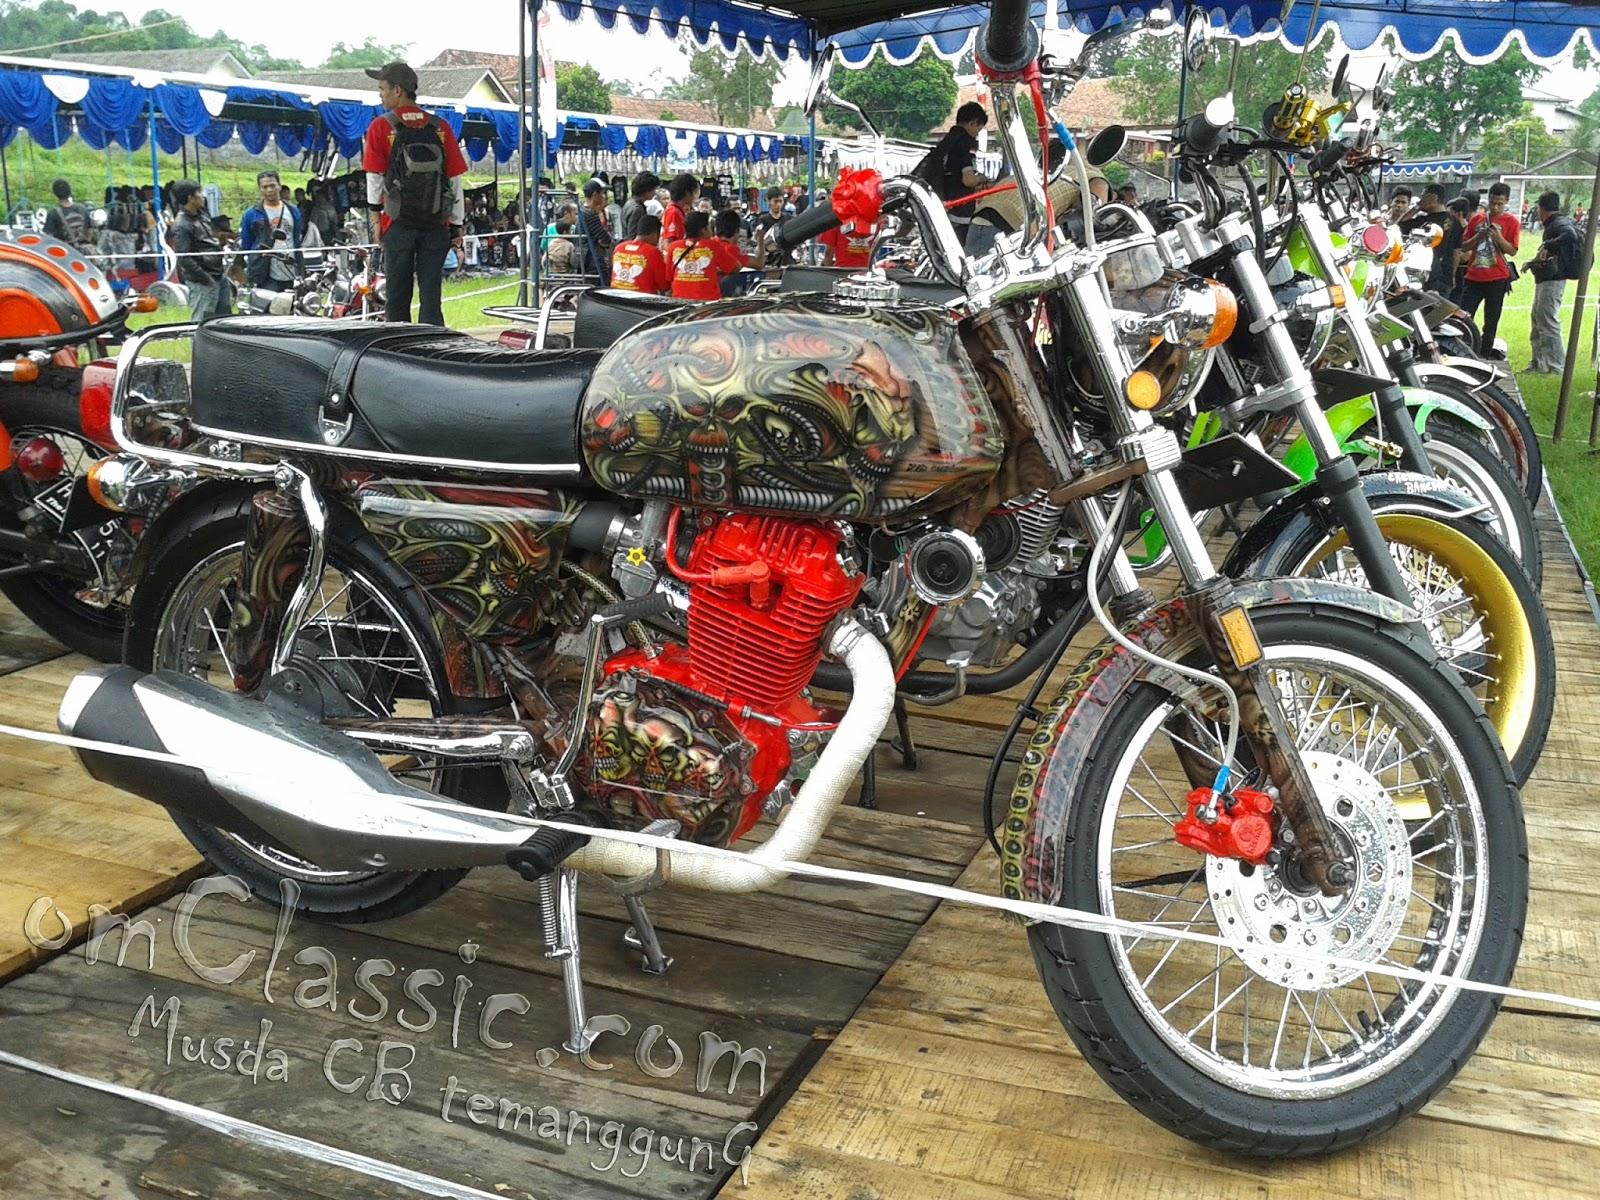 Foto Modifikasi Honda CB 100 Terbaru April 2016 Seribu Kabar